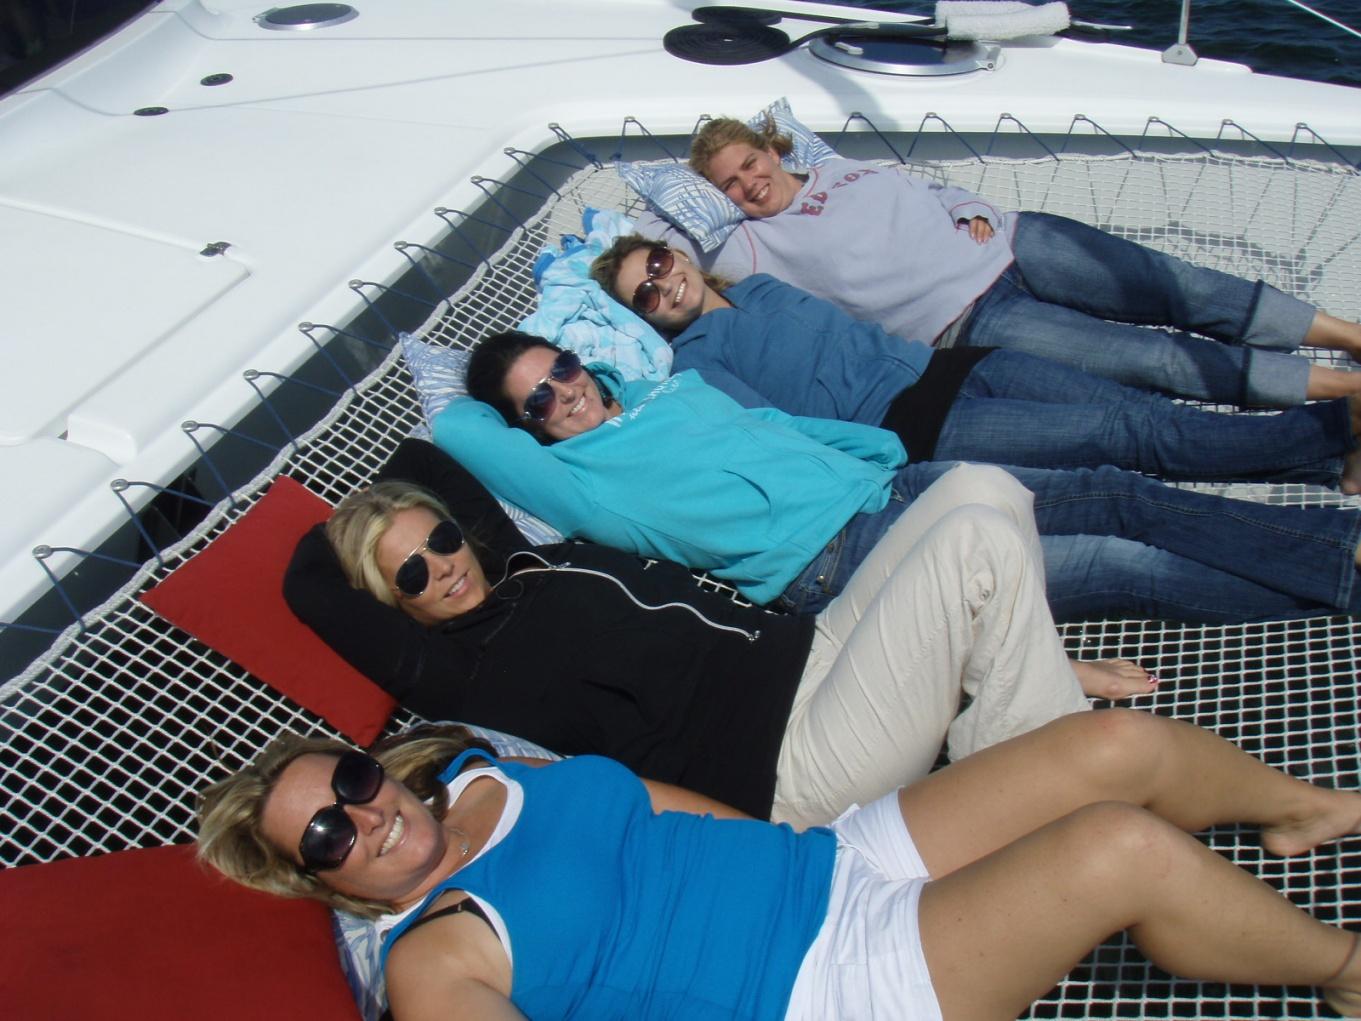 Click image for larger version  Name:Catamaran girls.jpg Views:537 Size:417.4 KB ID:70149